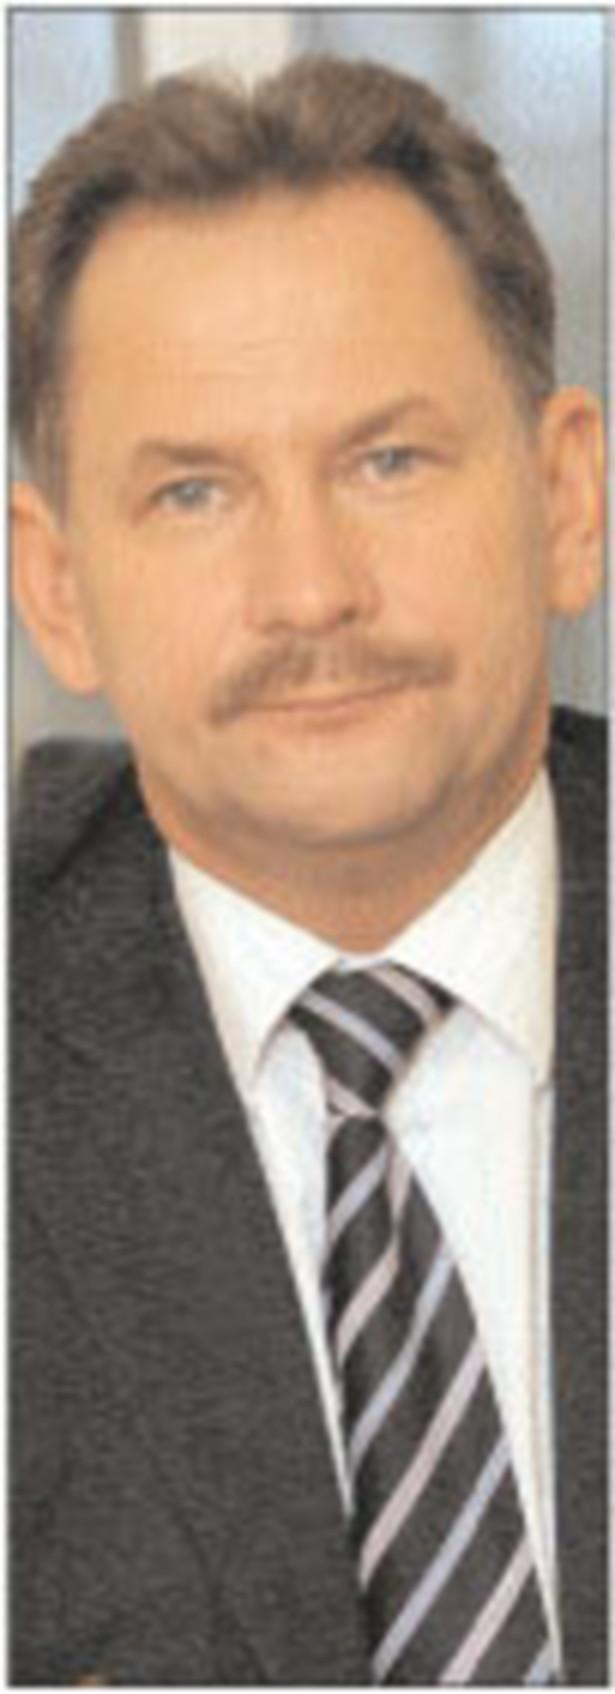 Dariusz Lubera, prezes zarządu Tauron Polska Energia